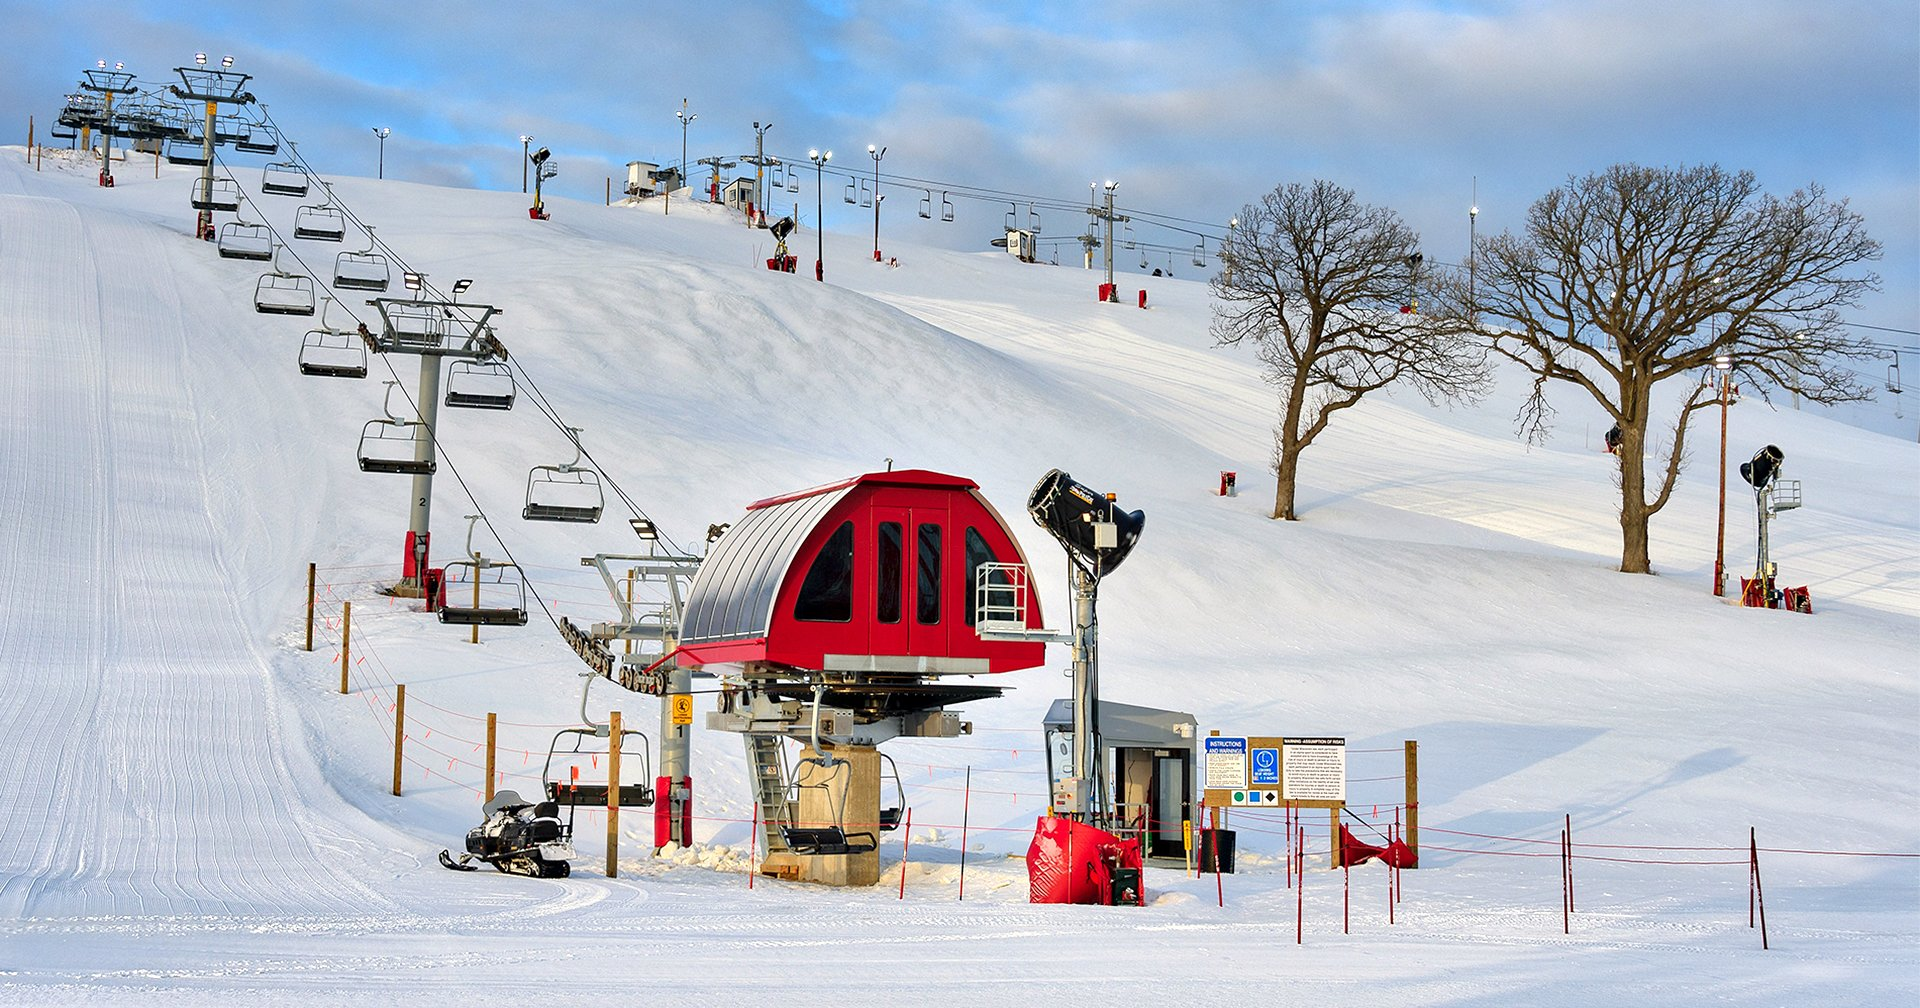 winter fun in southeastern wisconsin   downhill skiiing & snowboarding!